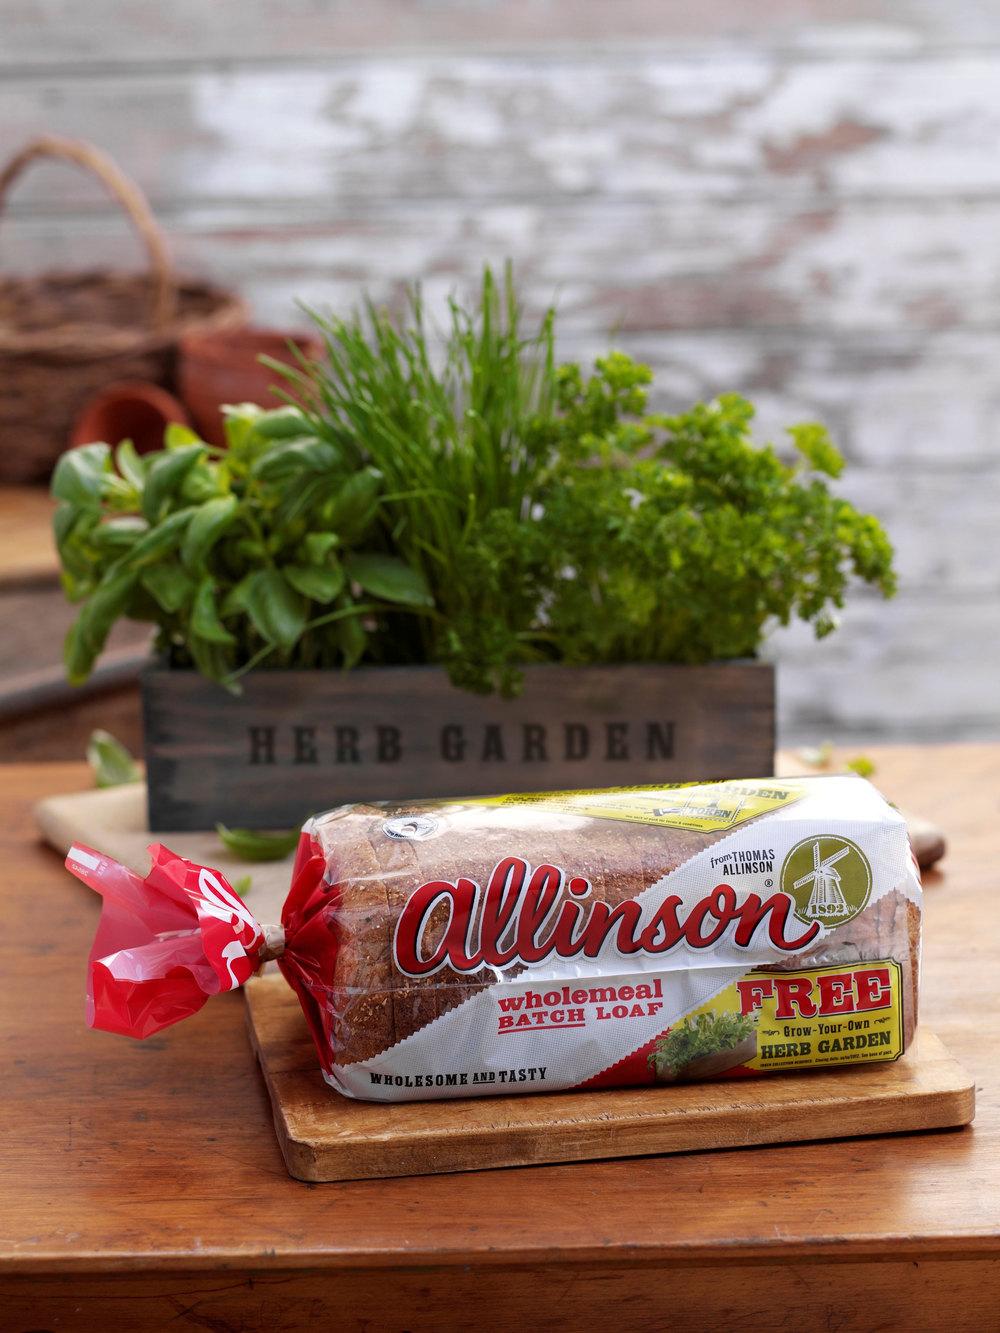 Allinson-PR-Image1.jpg